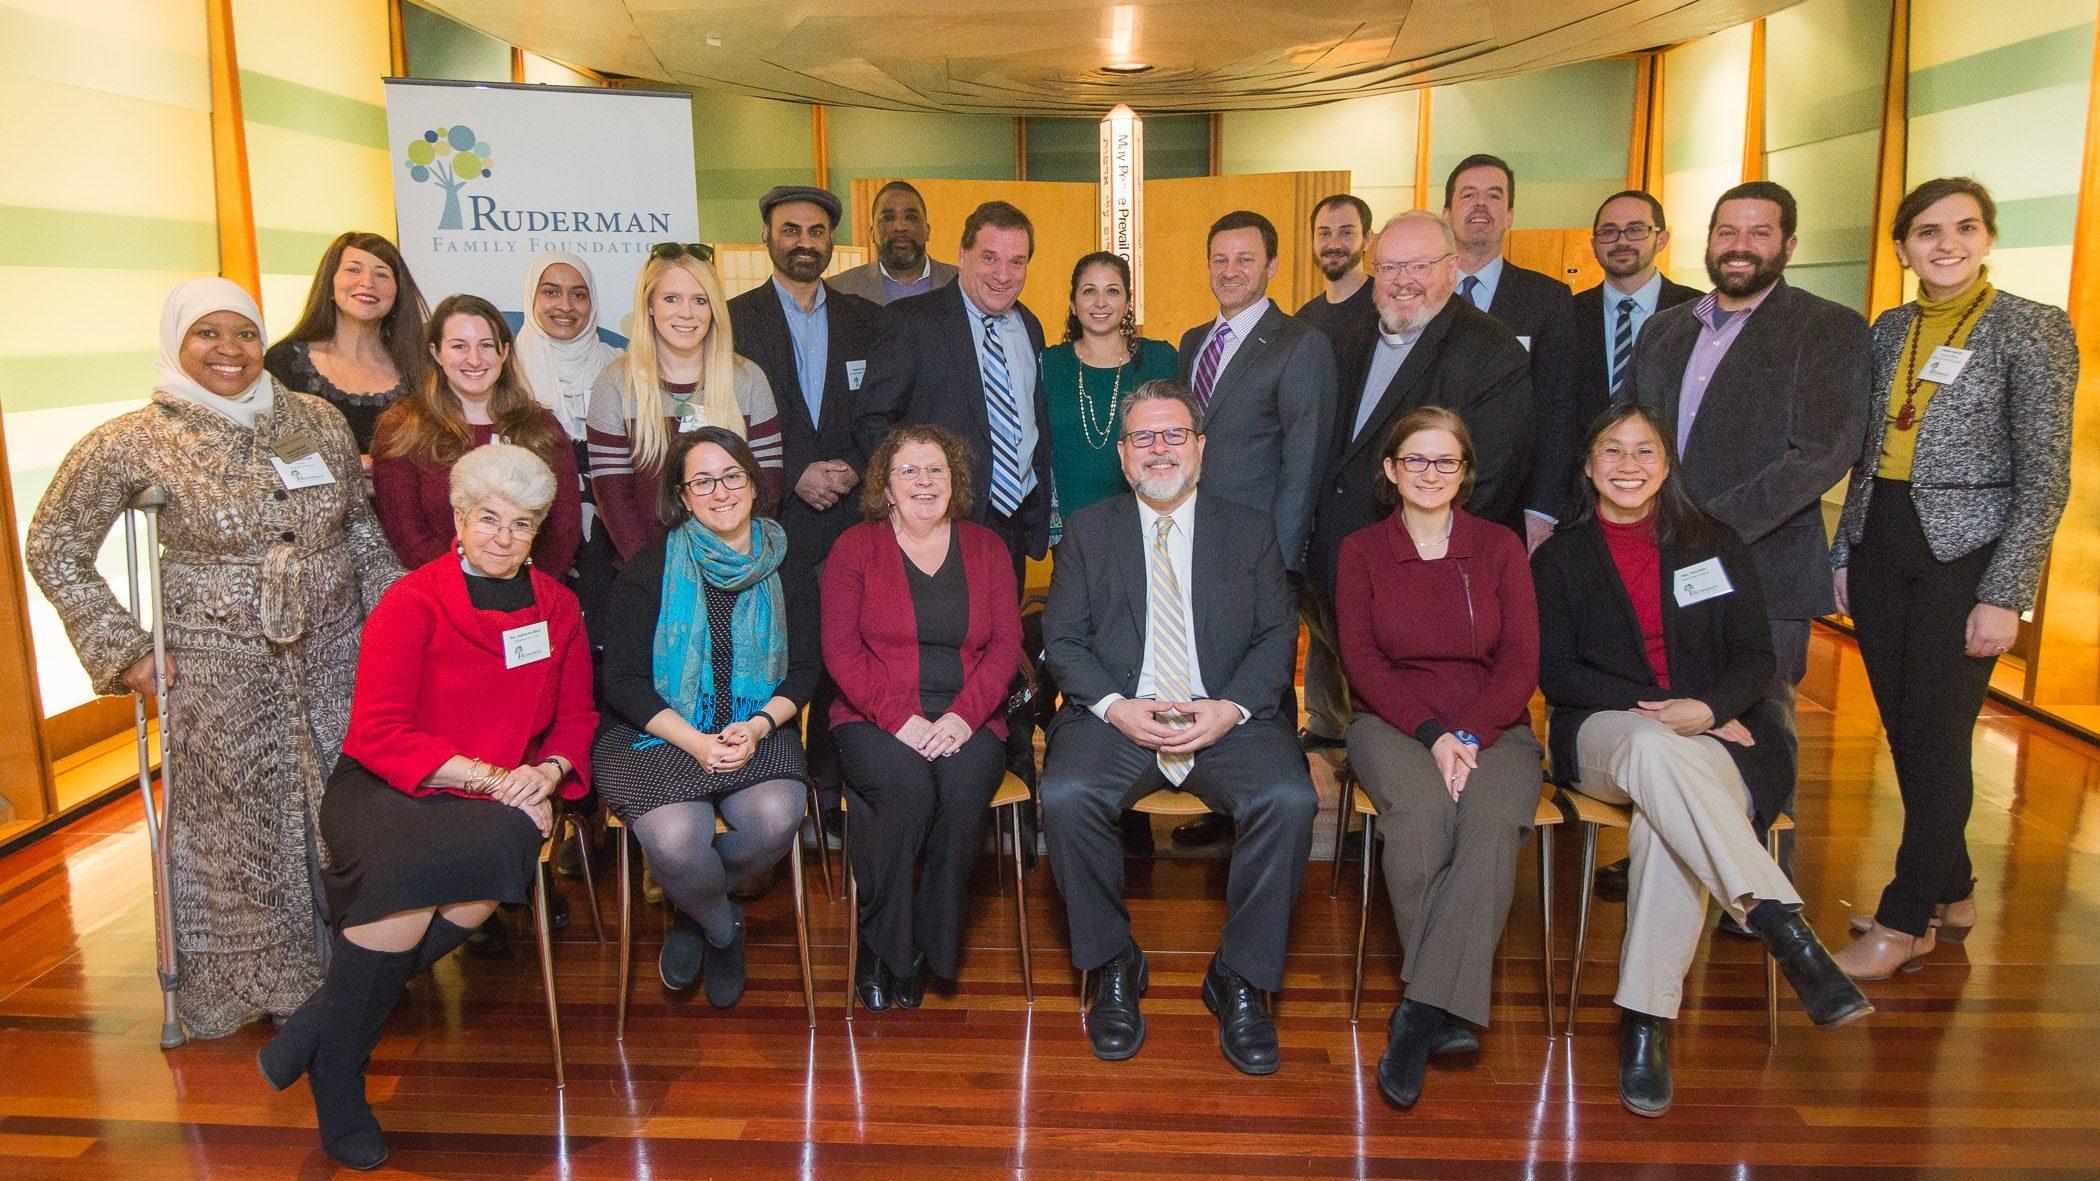 Interfaith Summit on Inclusion – December 3, 2019